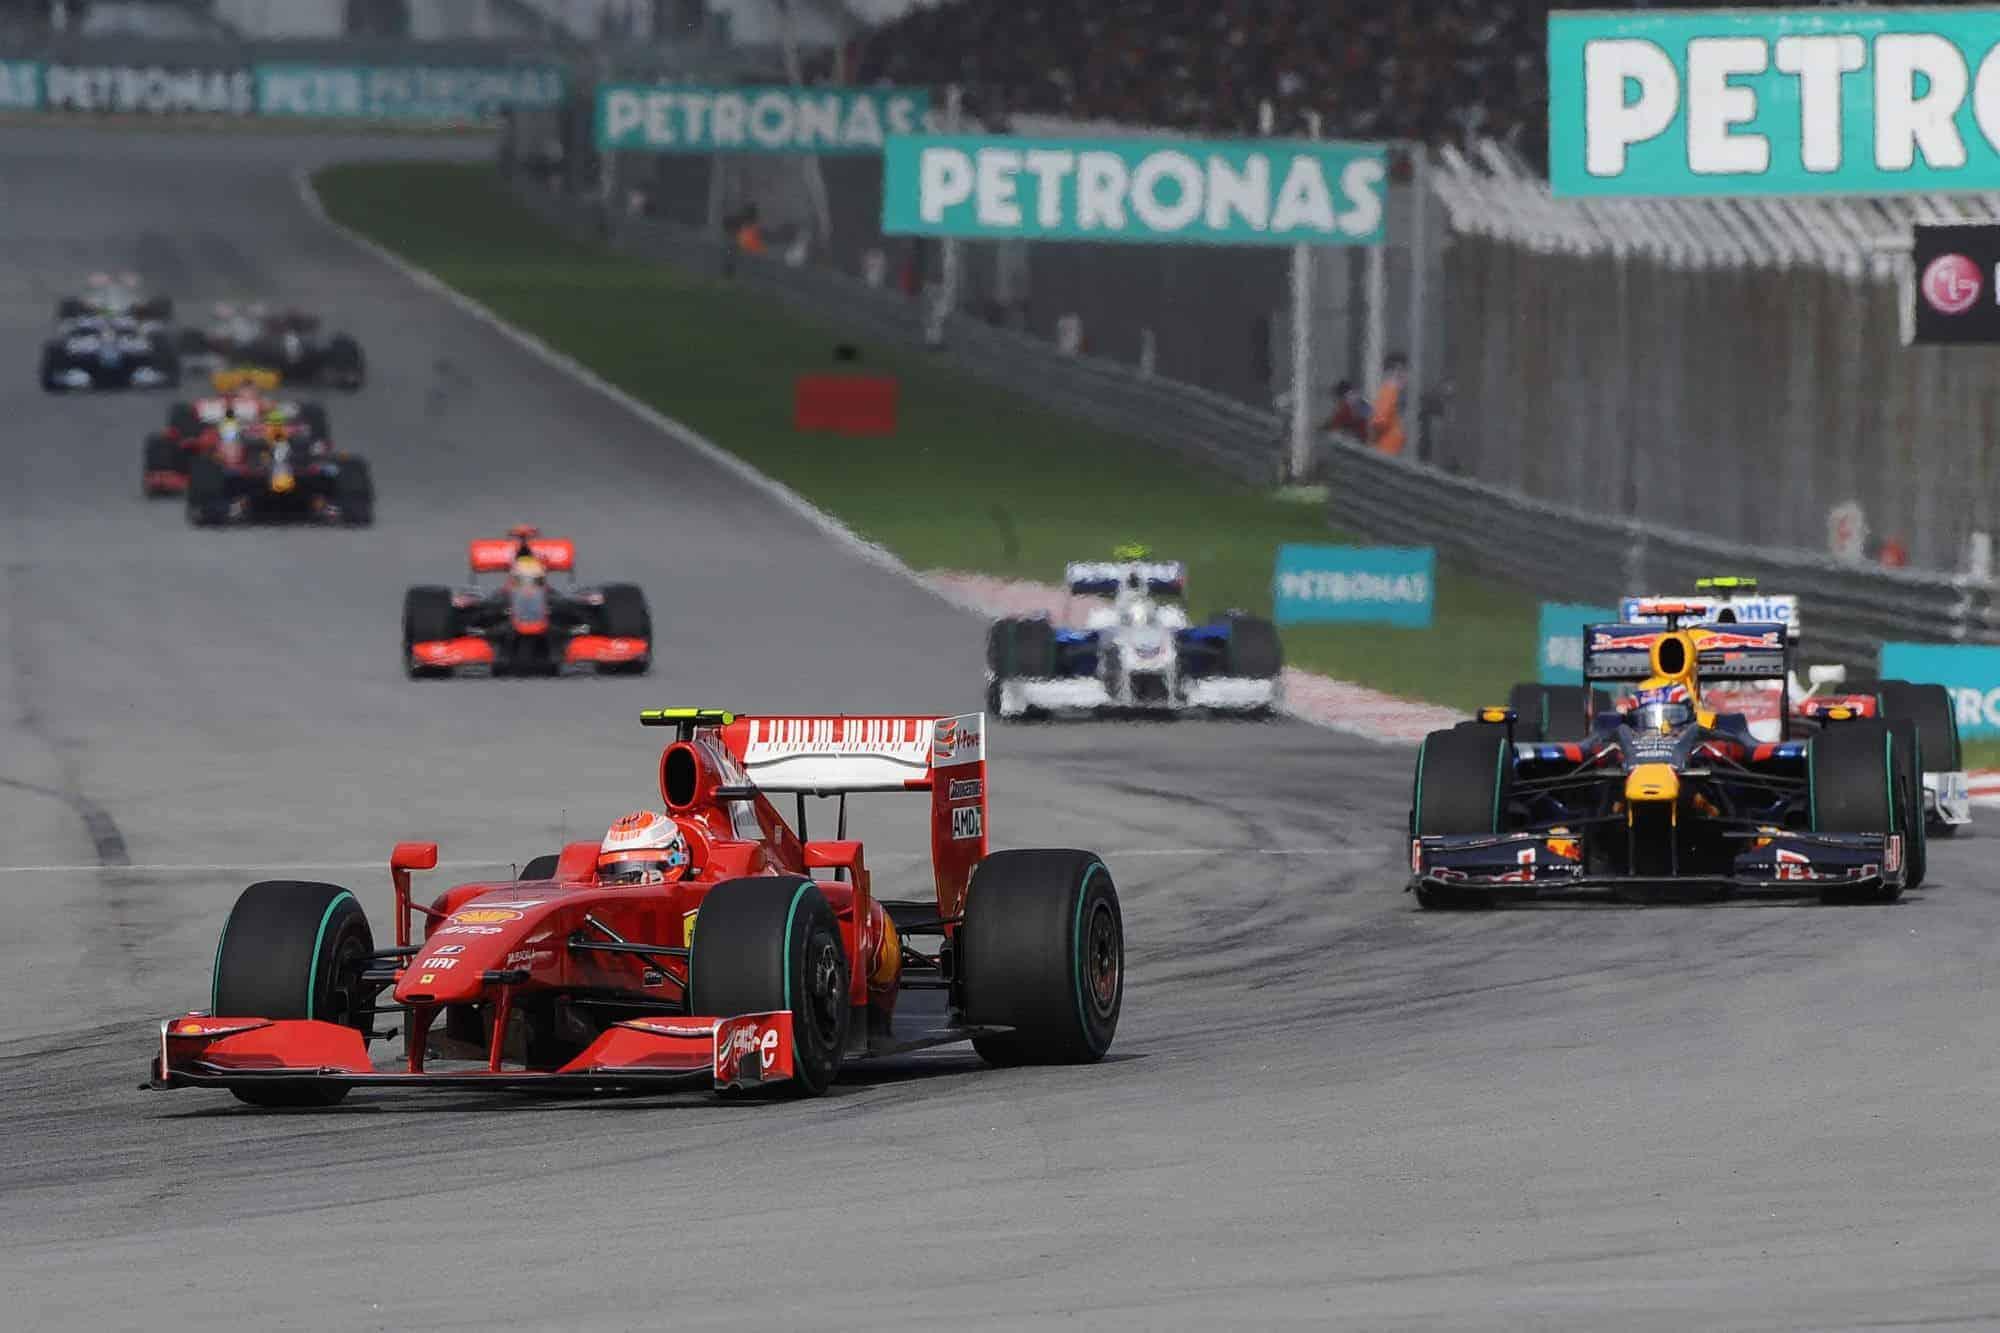 2009 Malaysian GP Raikkonen leads Webber Photo Ferrari